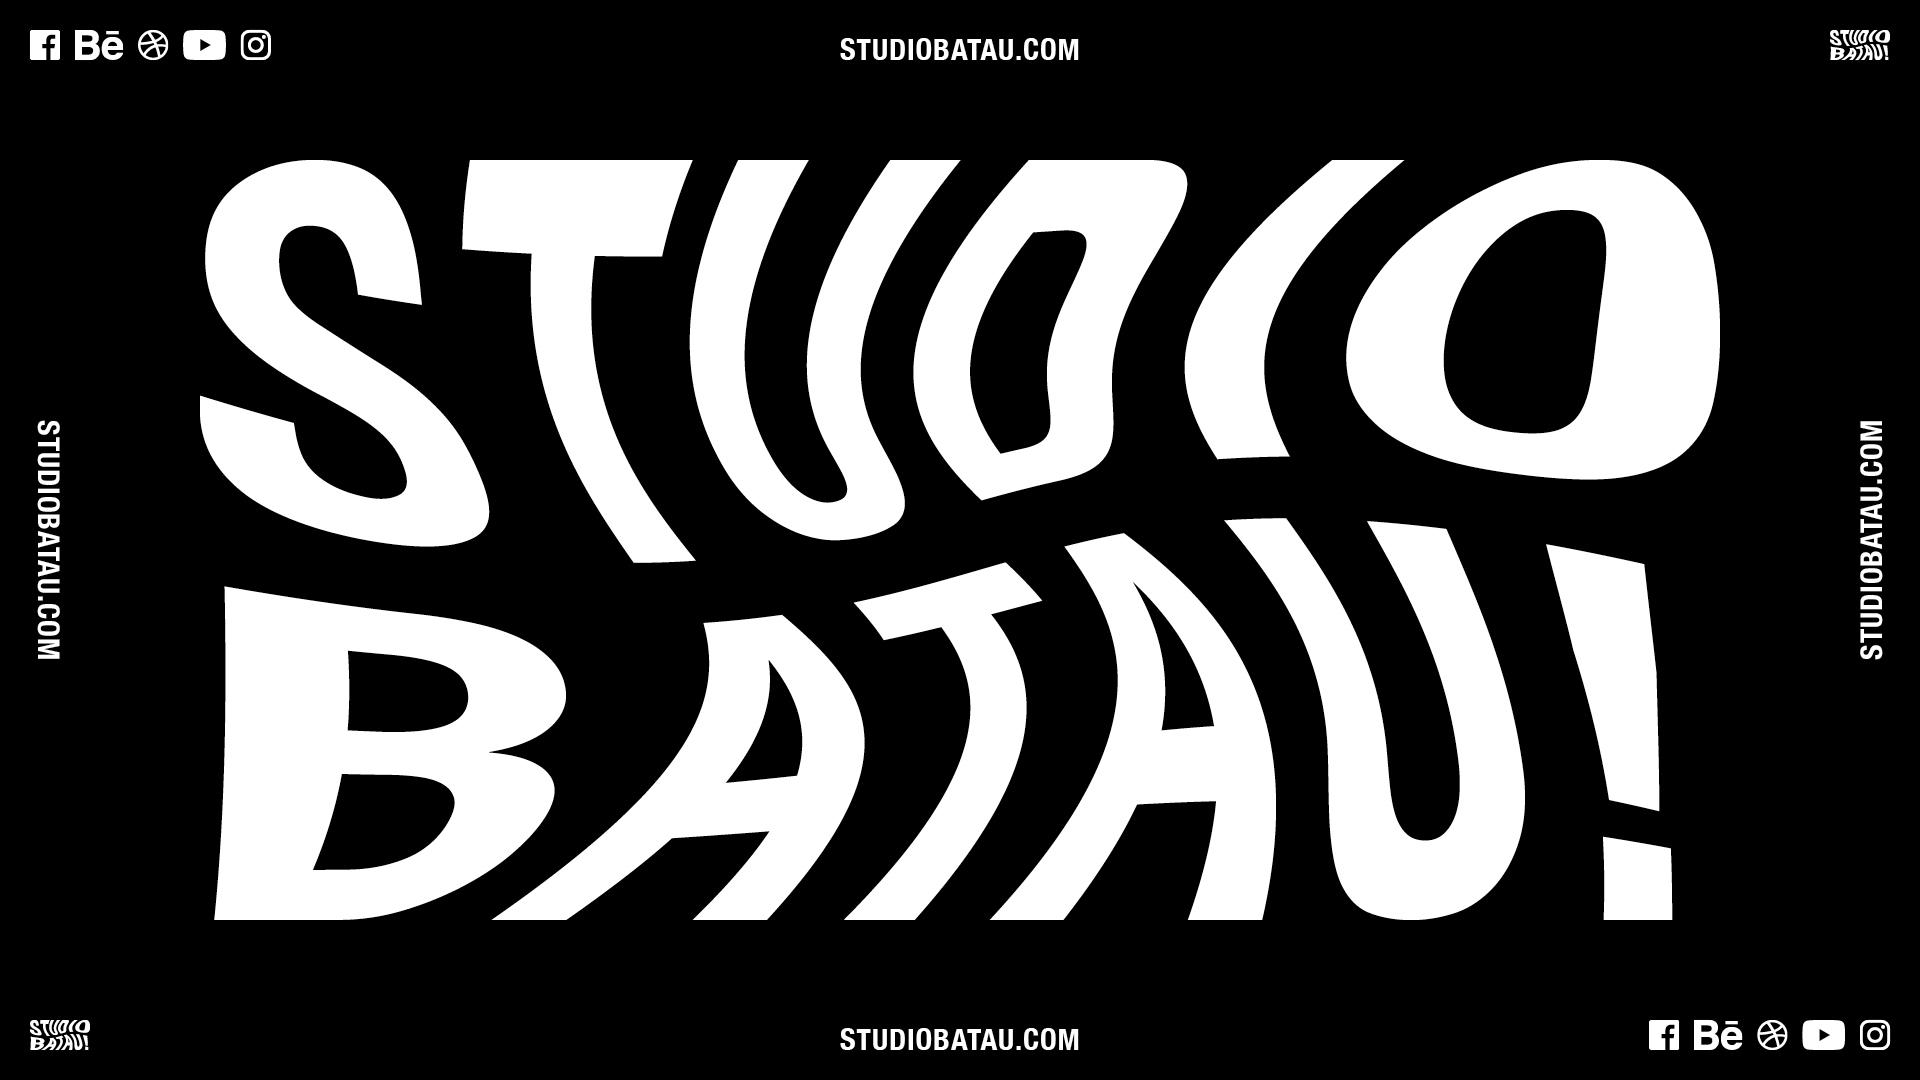 Studio Batau